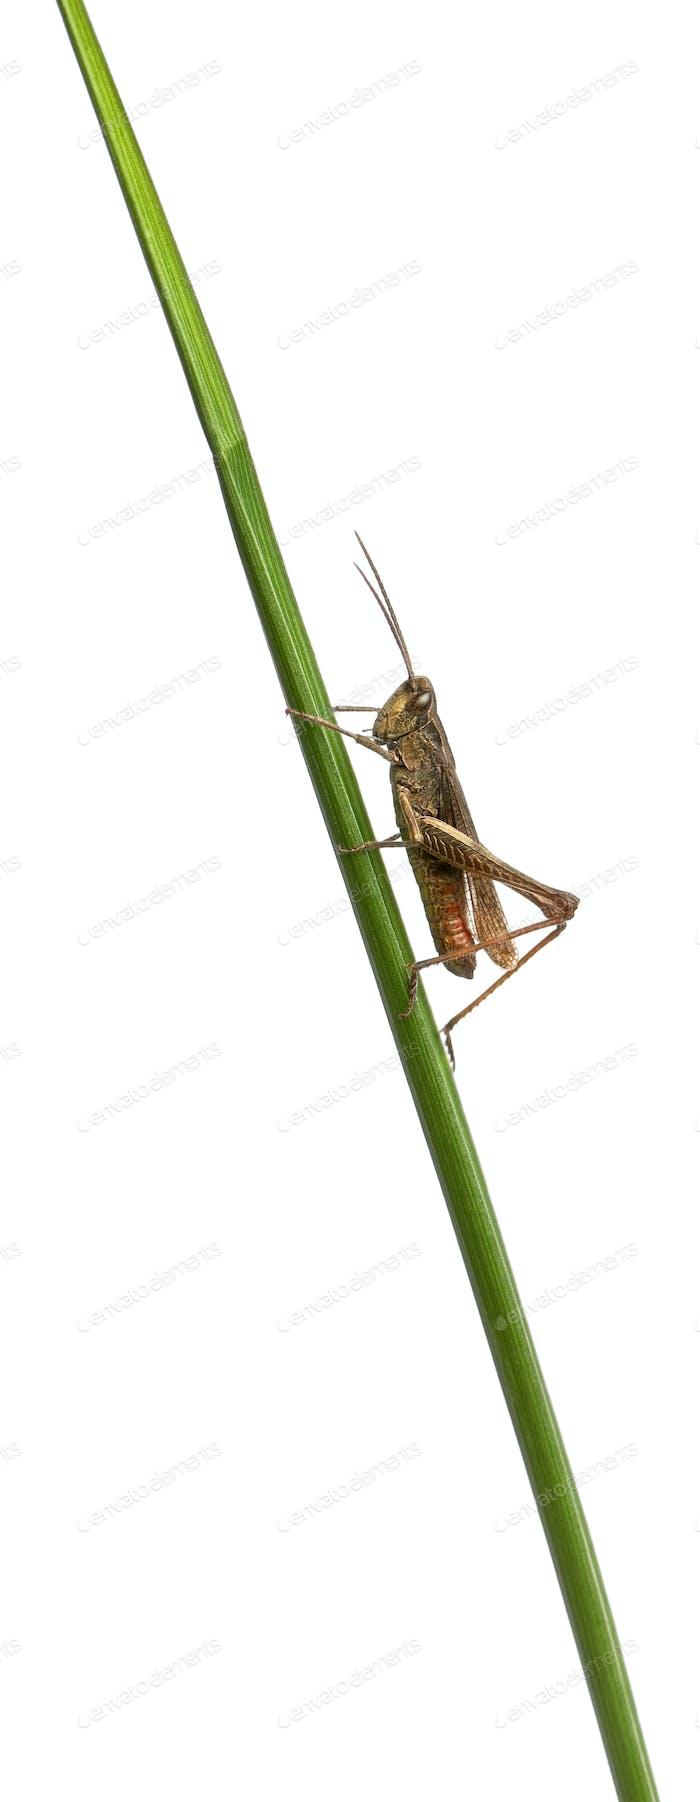 Grasshopper, Chorthippus montanus, on plant stem in front of white background